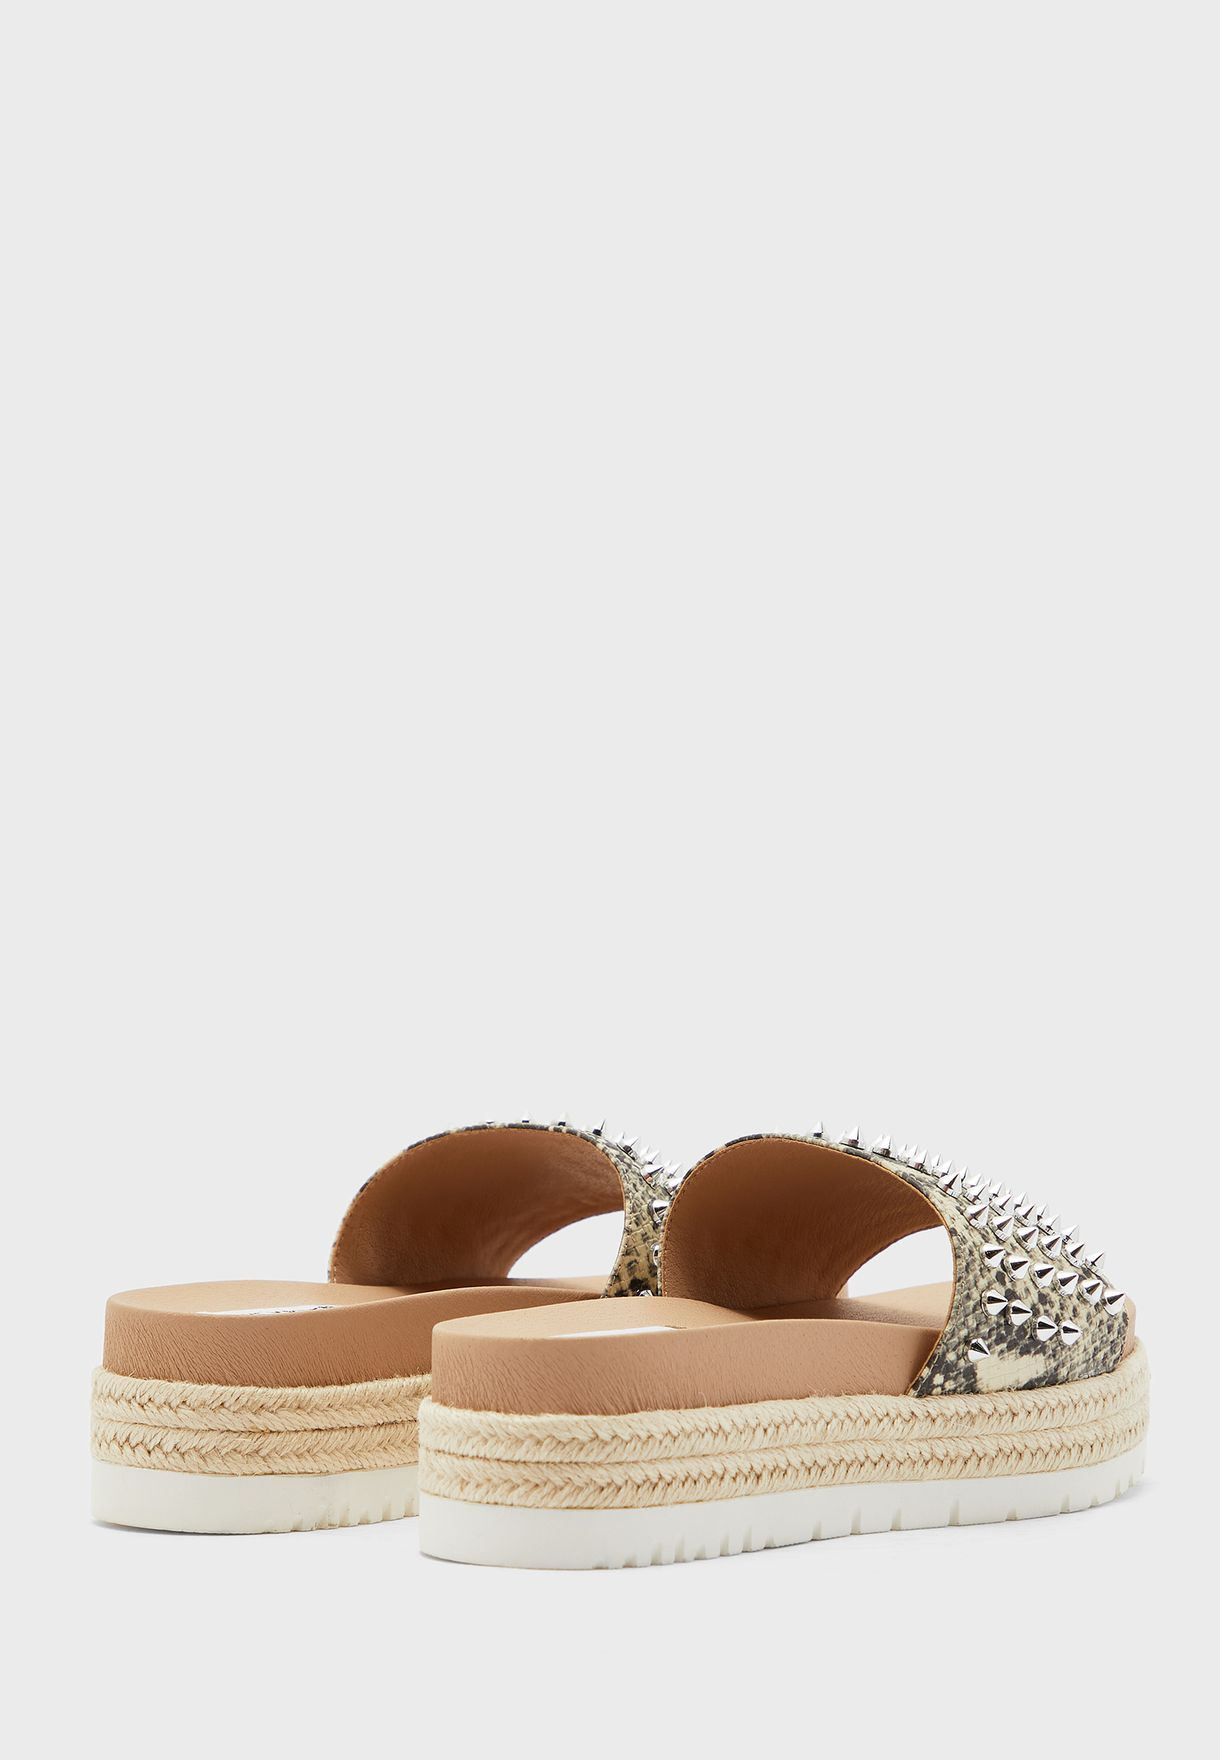 Tazer-S Mid Heel Wedge Sandal